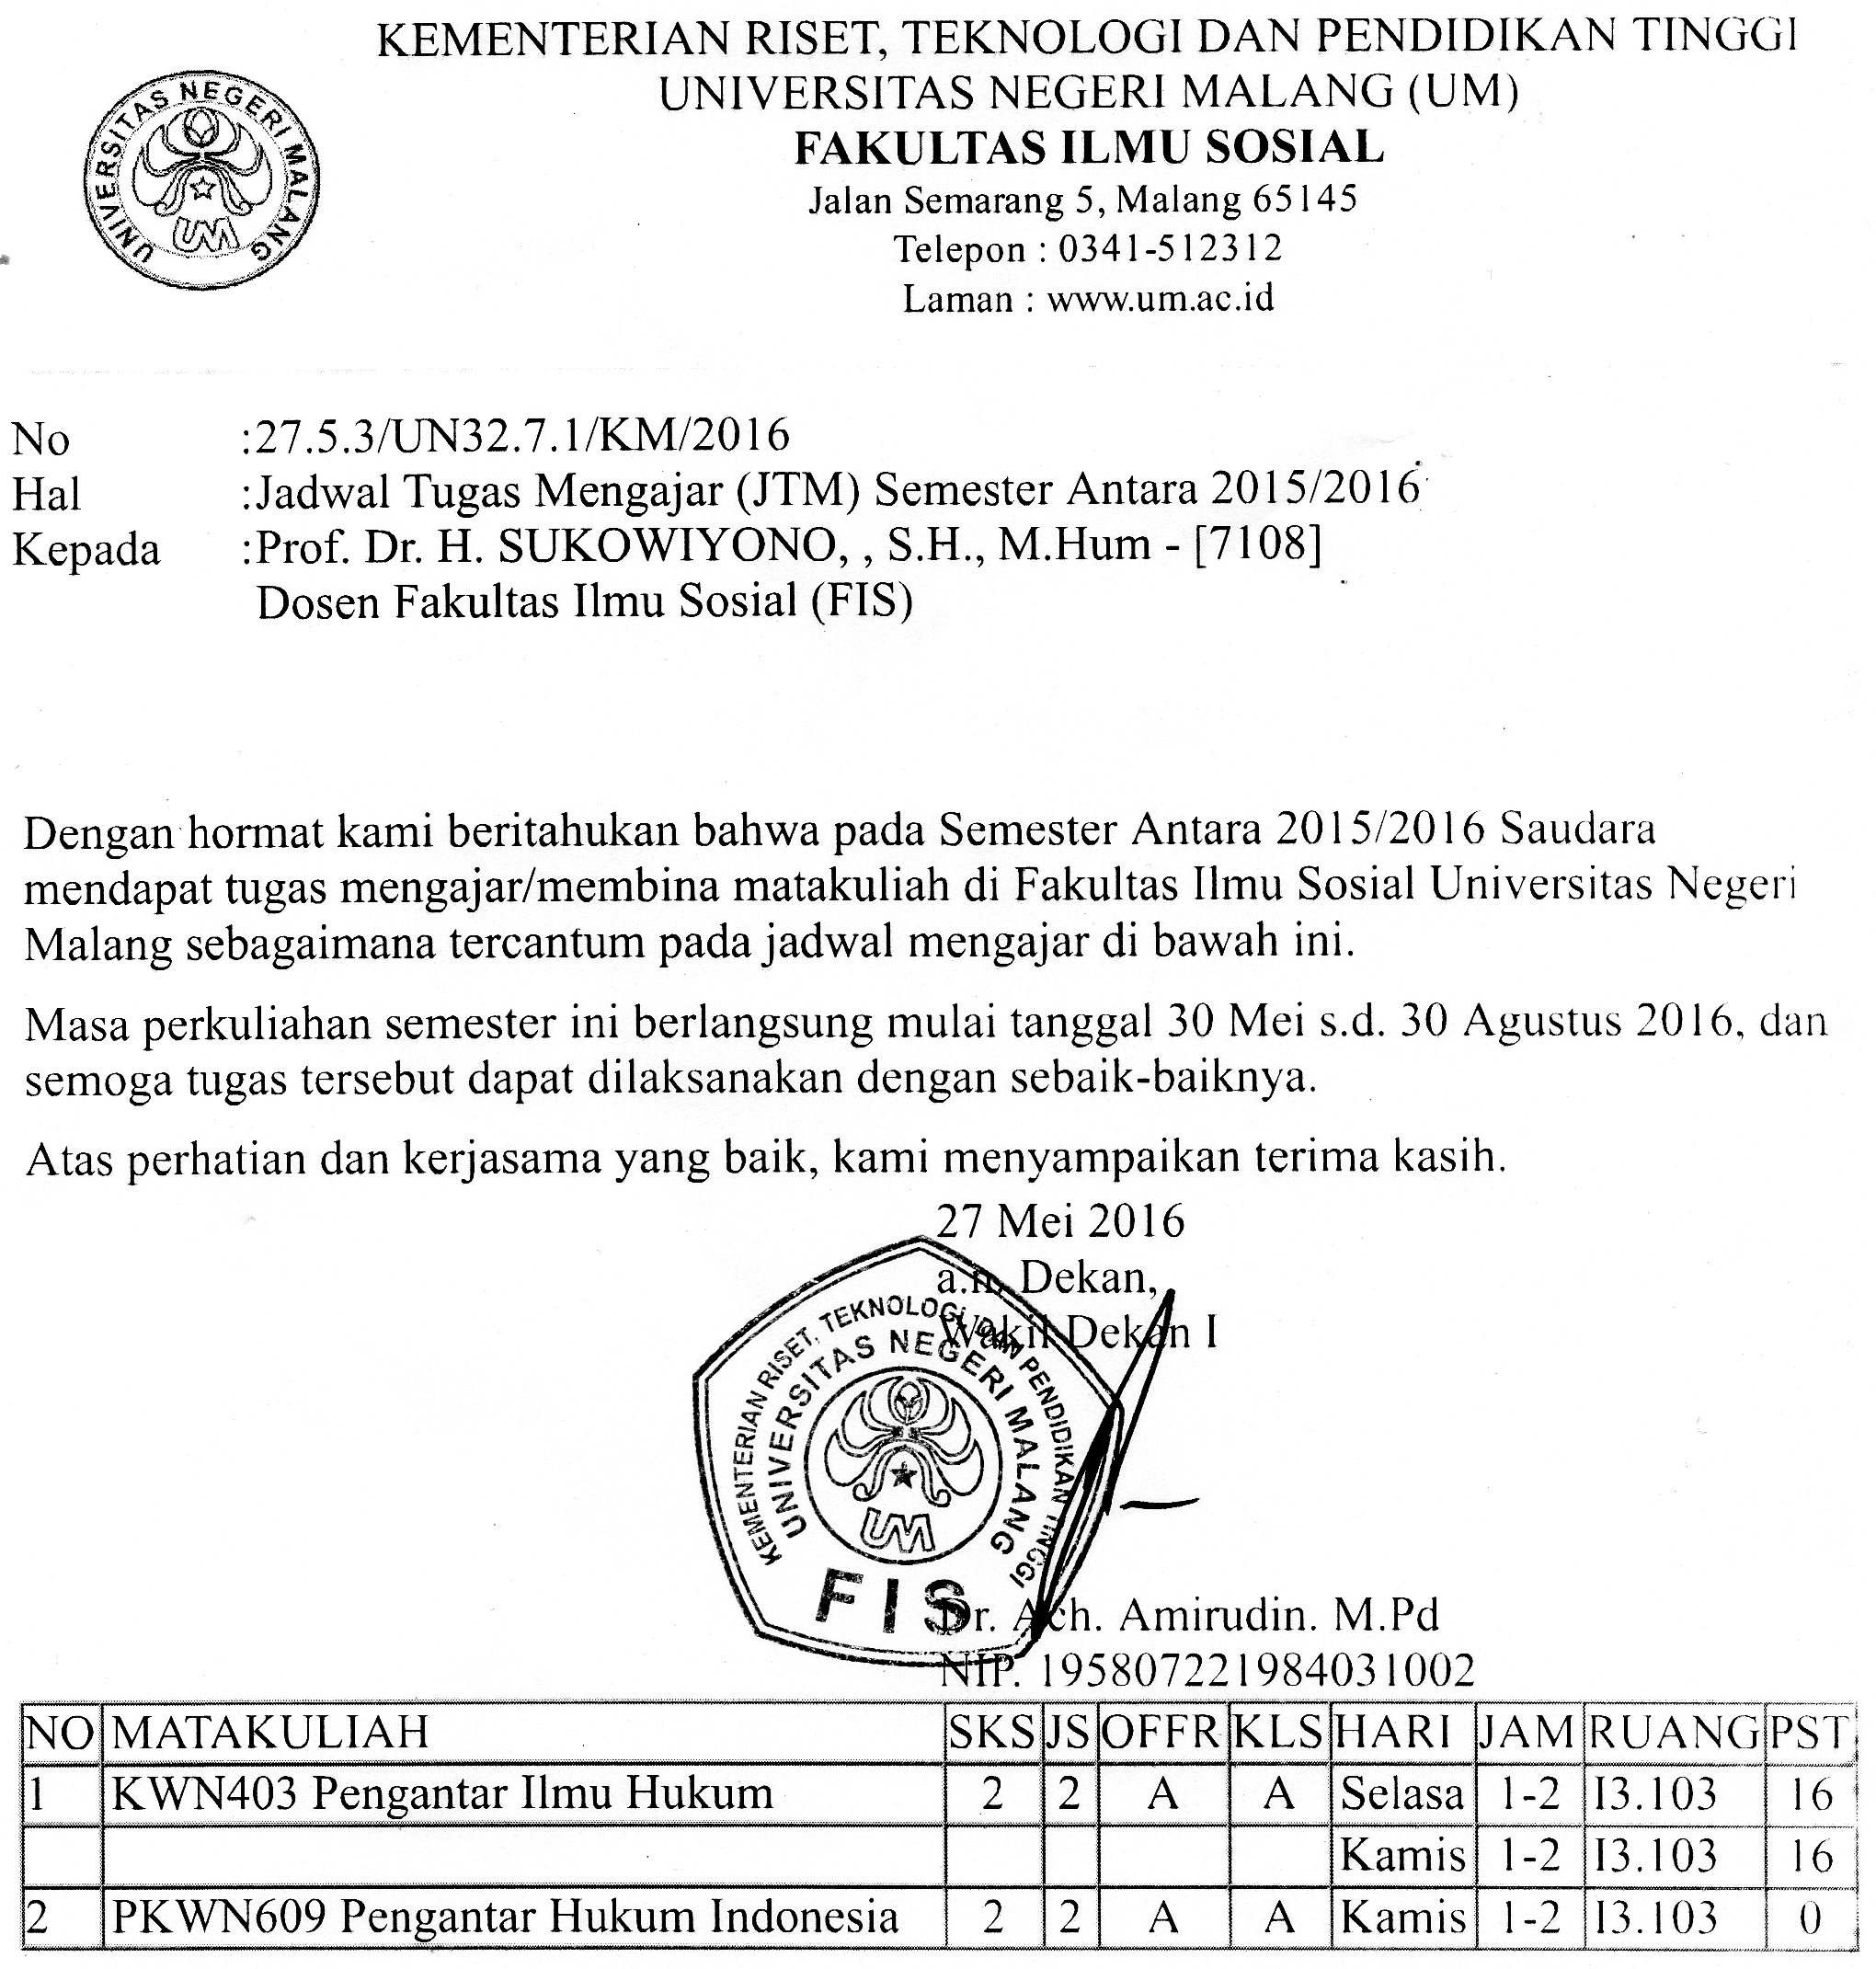 Jadwal Semester Antara 2015/2016